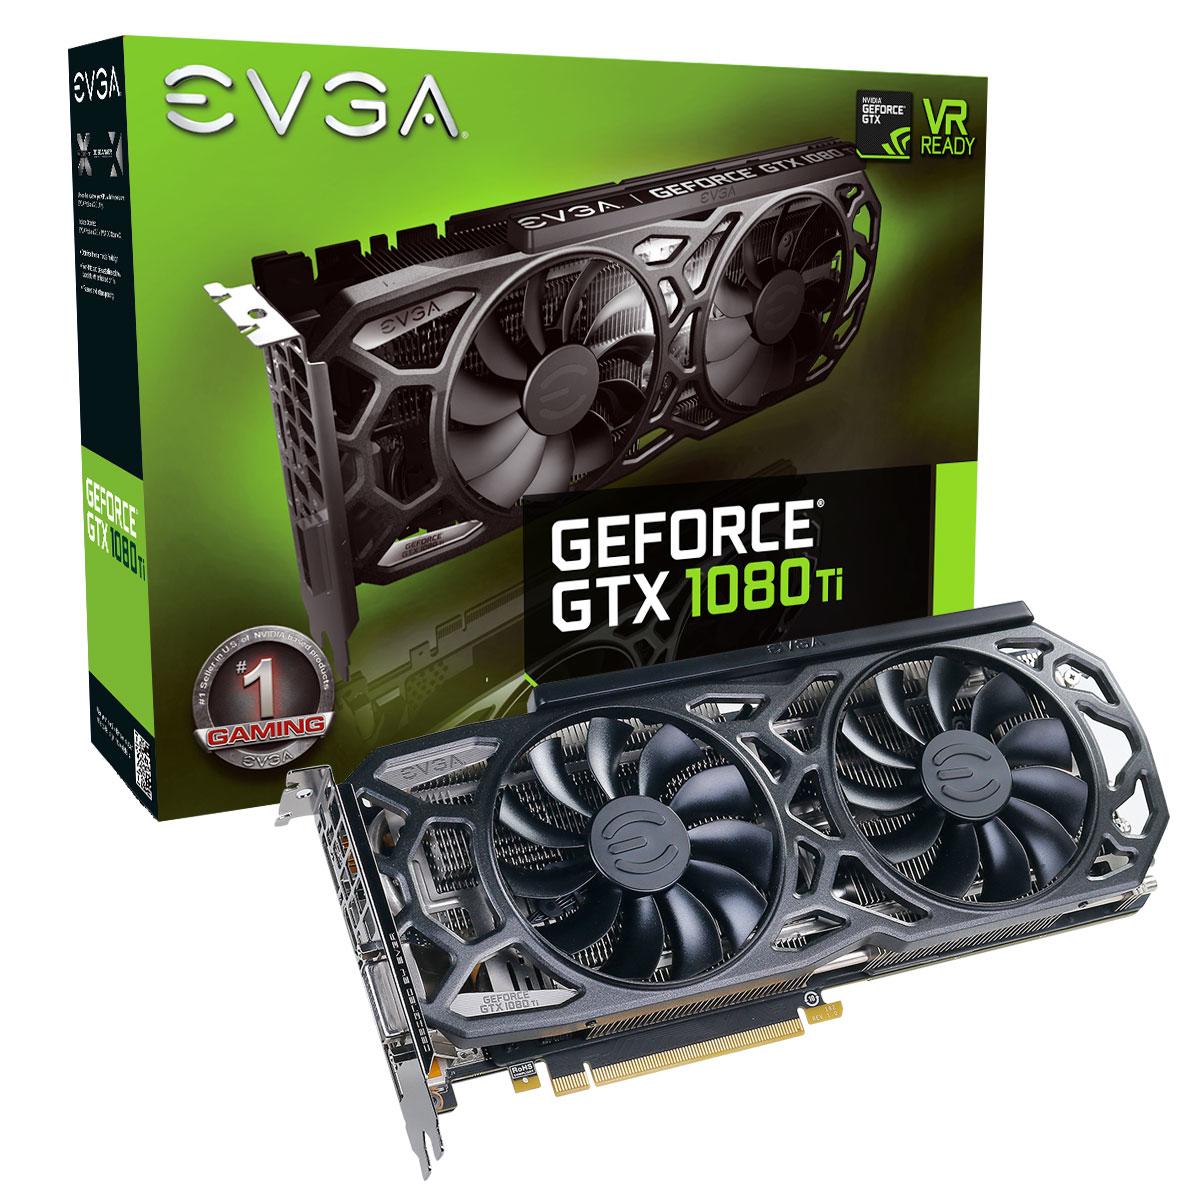 EVGA GeForce GTX 1080 Ti SC Black Edition Gaming, 11GB GDDR5X, DVI, HDMI,  3x DisplayPort 11G-P4-6393-KR